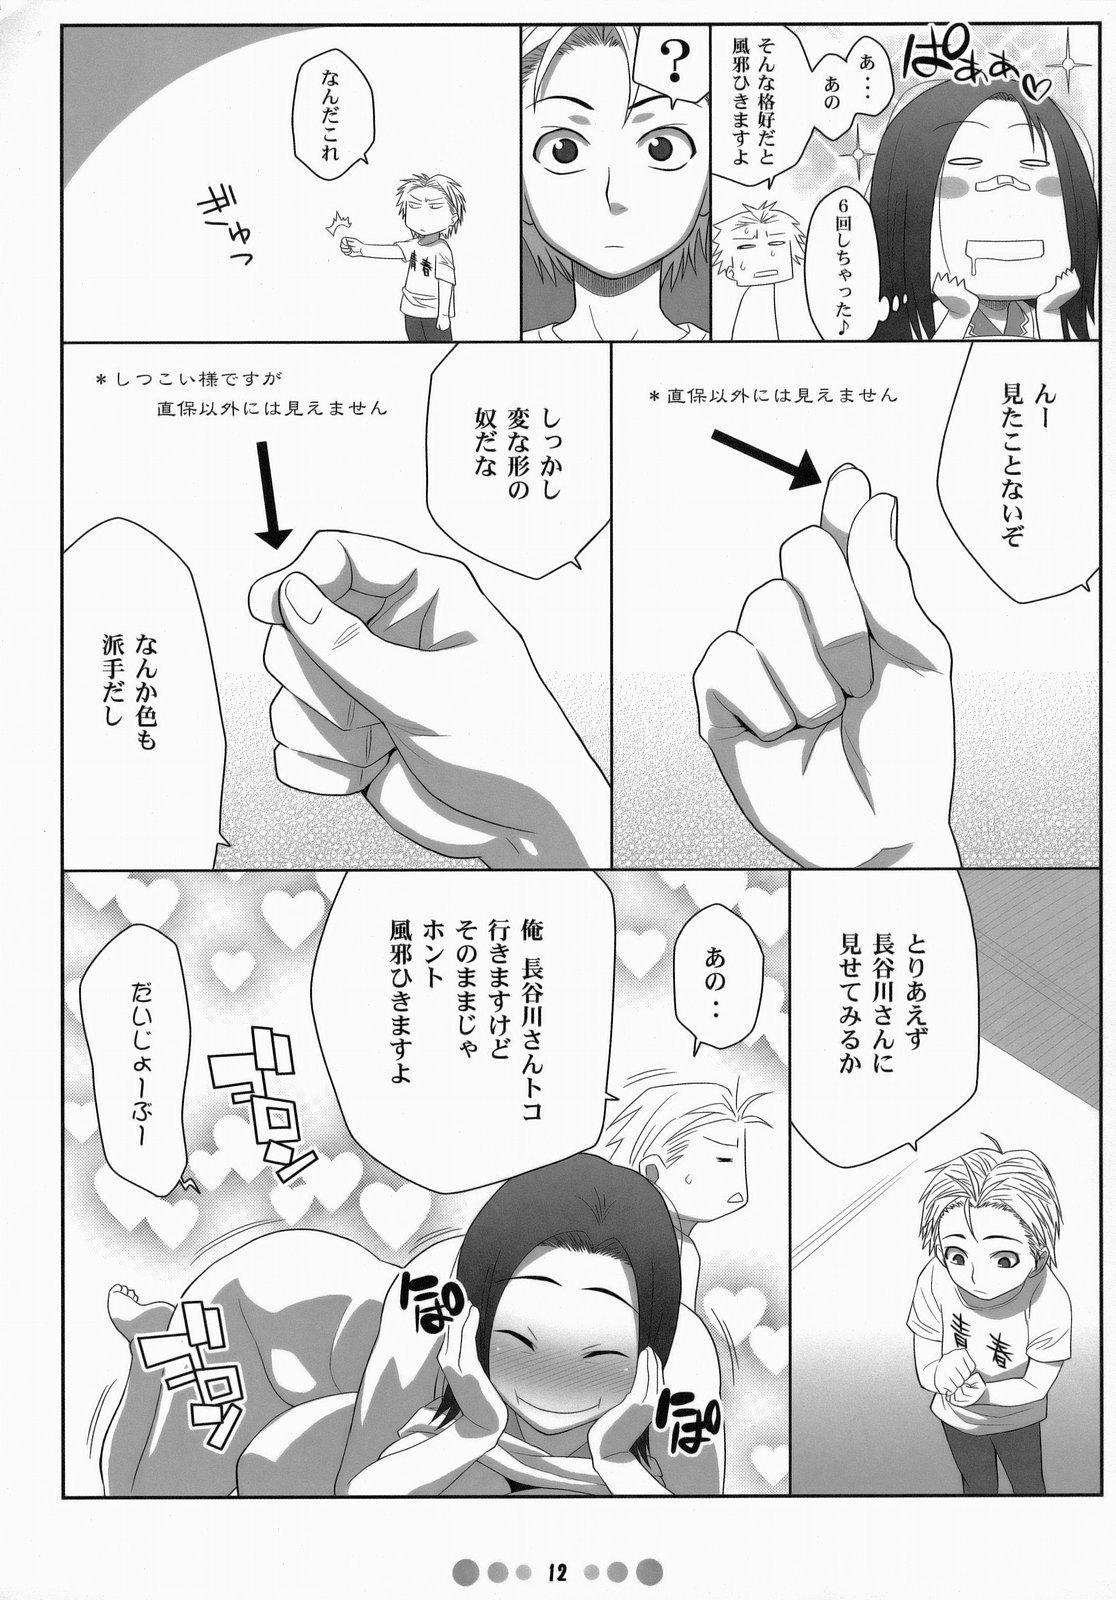 Miss Noudai to Noudai no Jyoousama 10